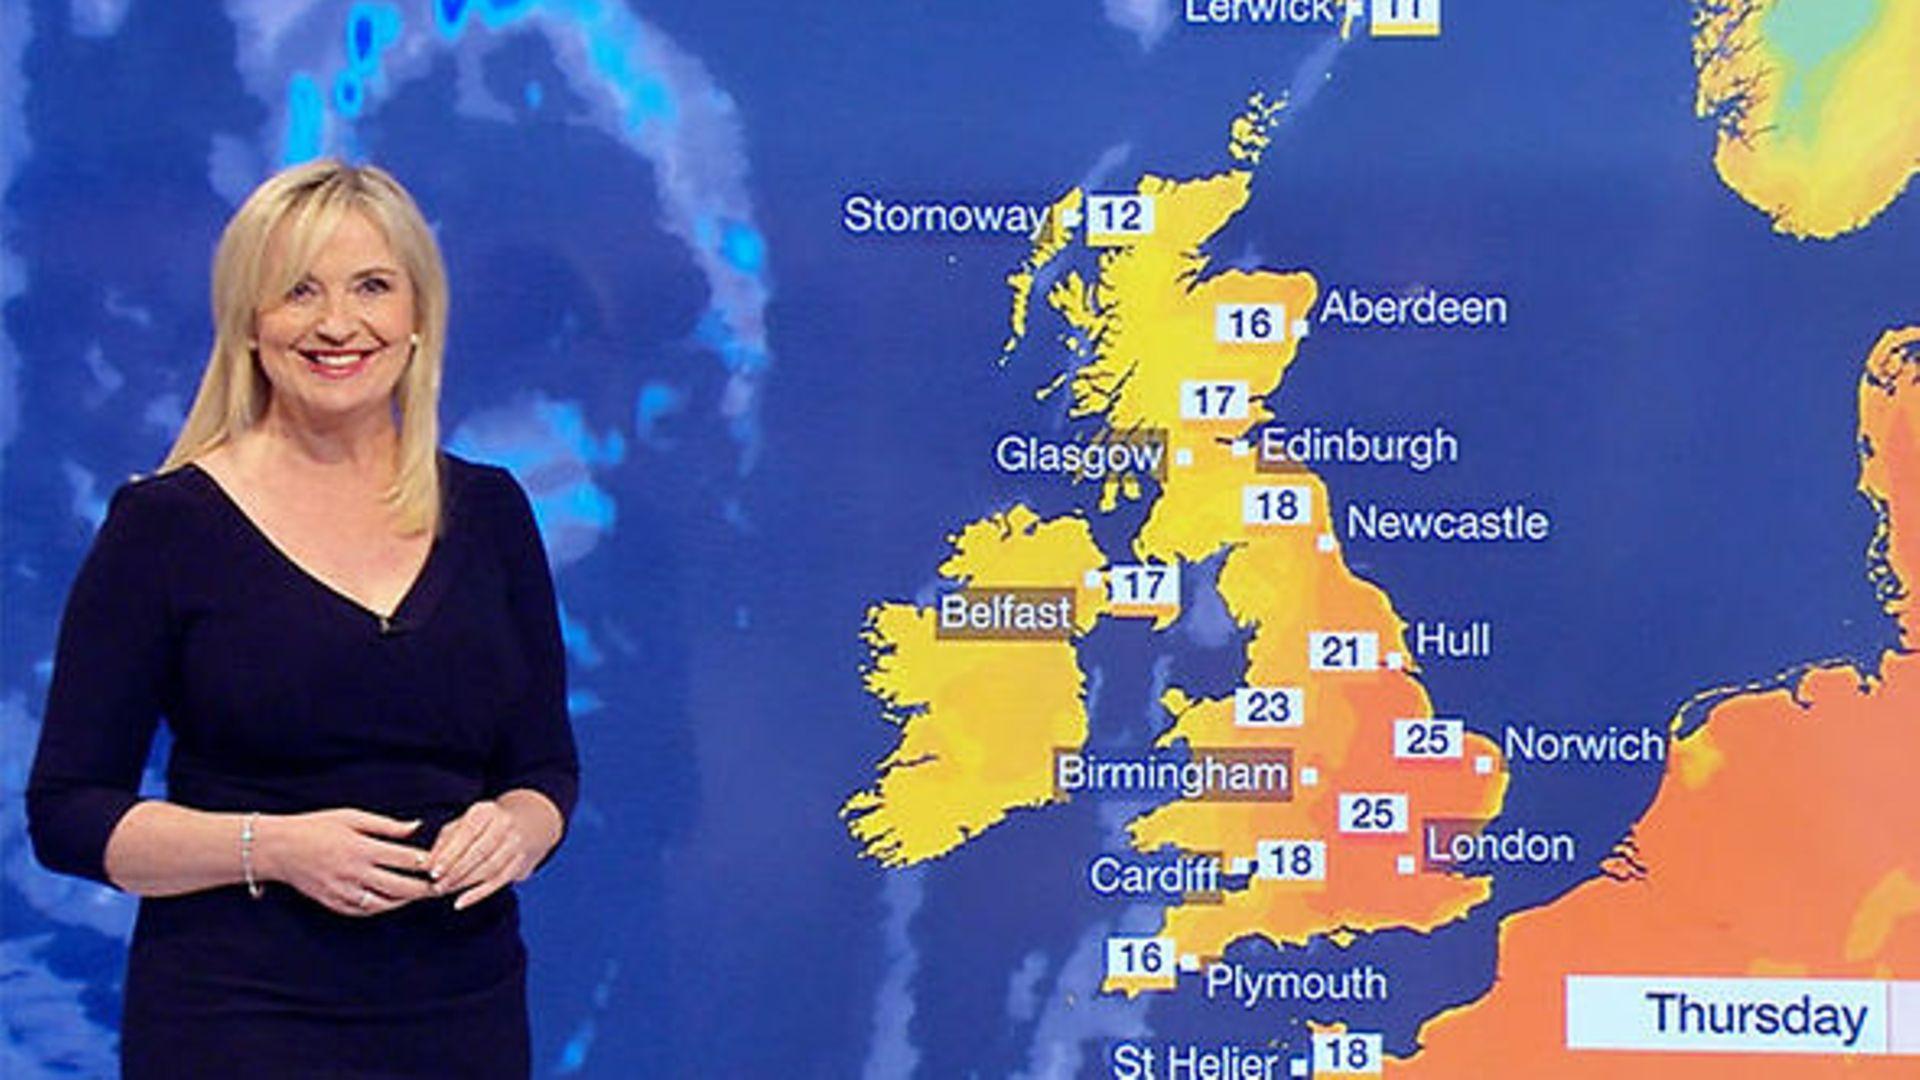 A BBC weather forecast - Credit: BBC